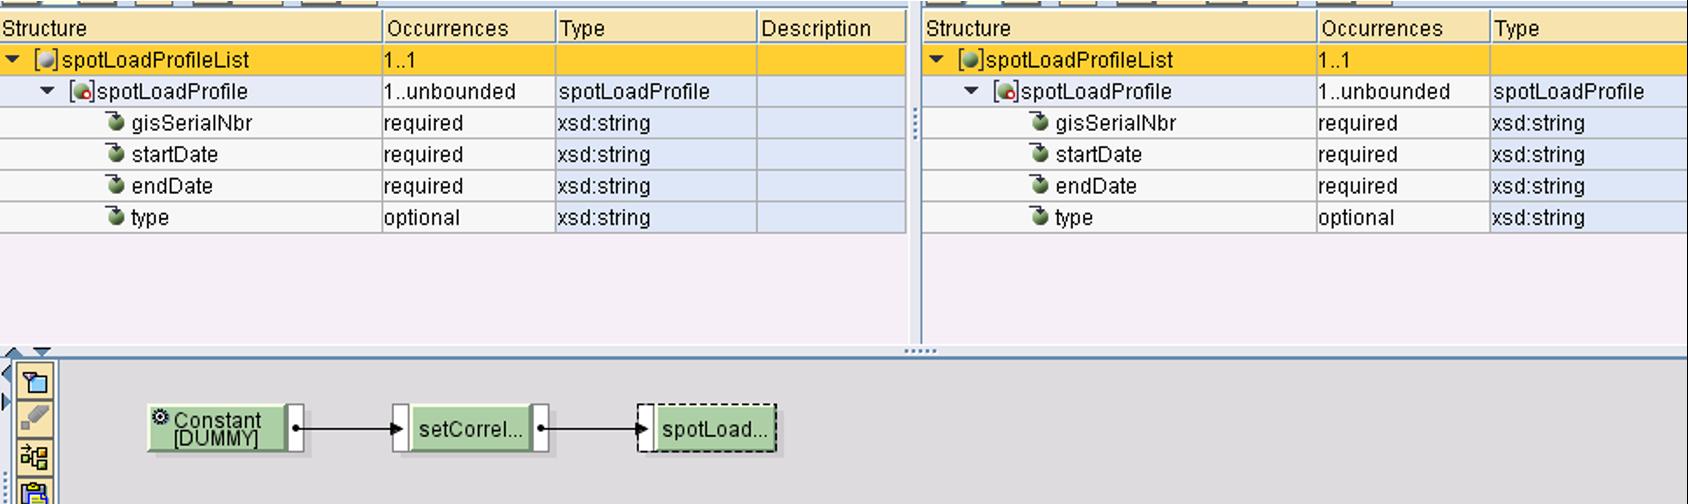 Dynamic Configuration JMS DCJMSCorreleationID